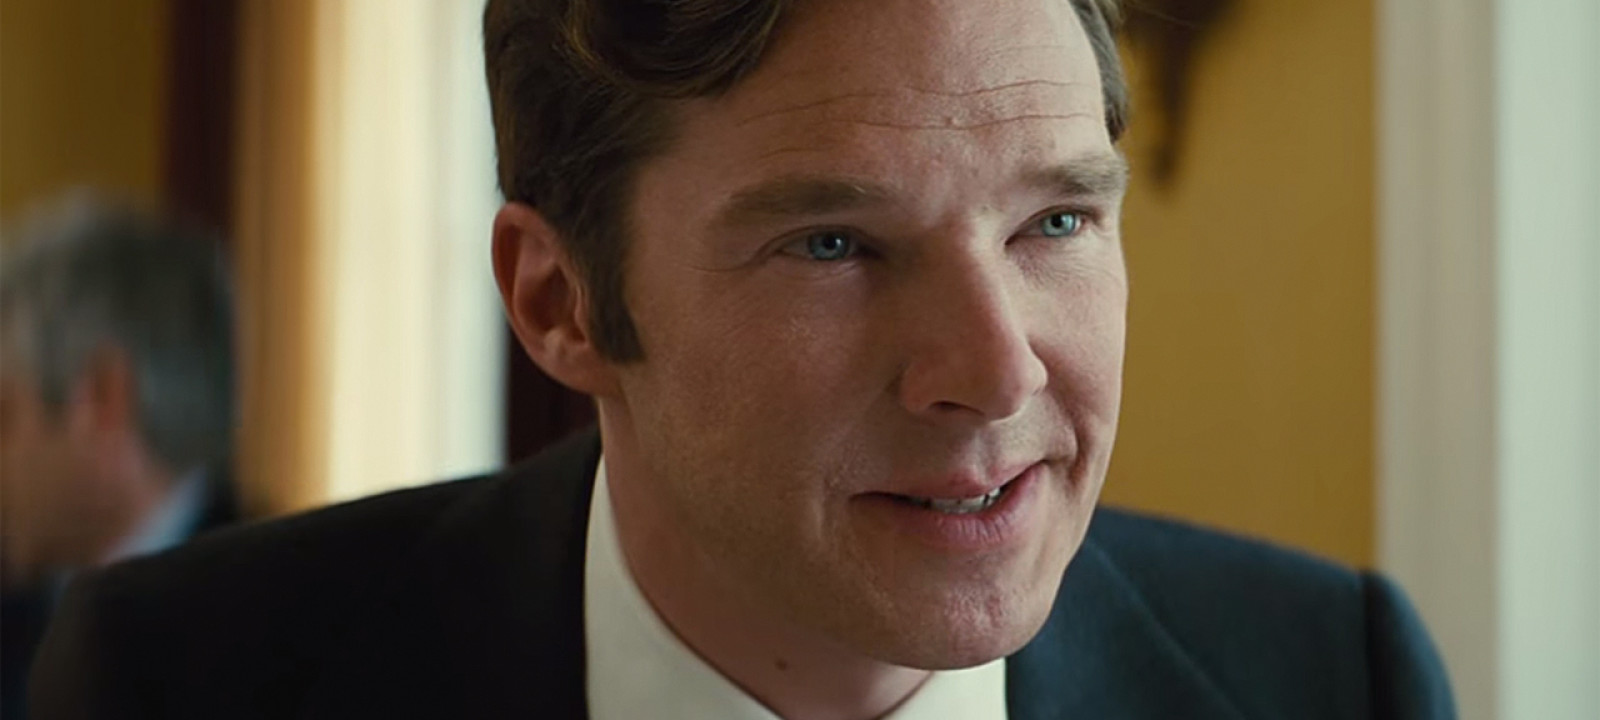 Benedict Cumberbatch in 'Black Mass' (Pic: Warner Bros)